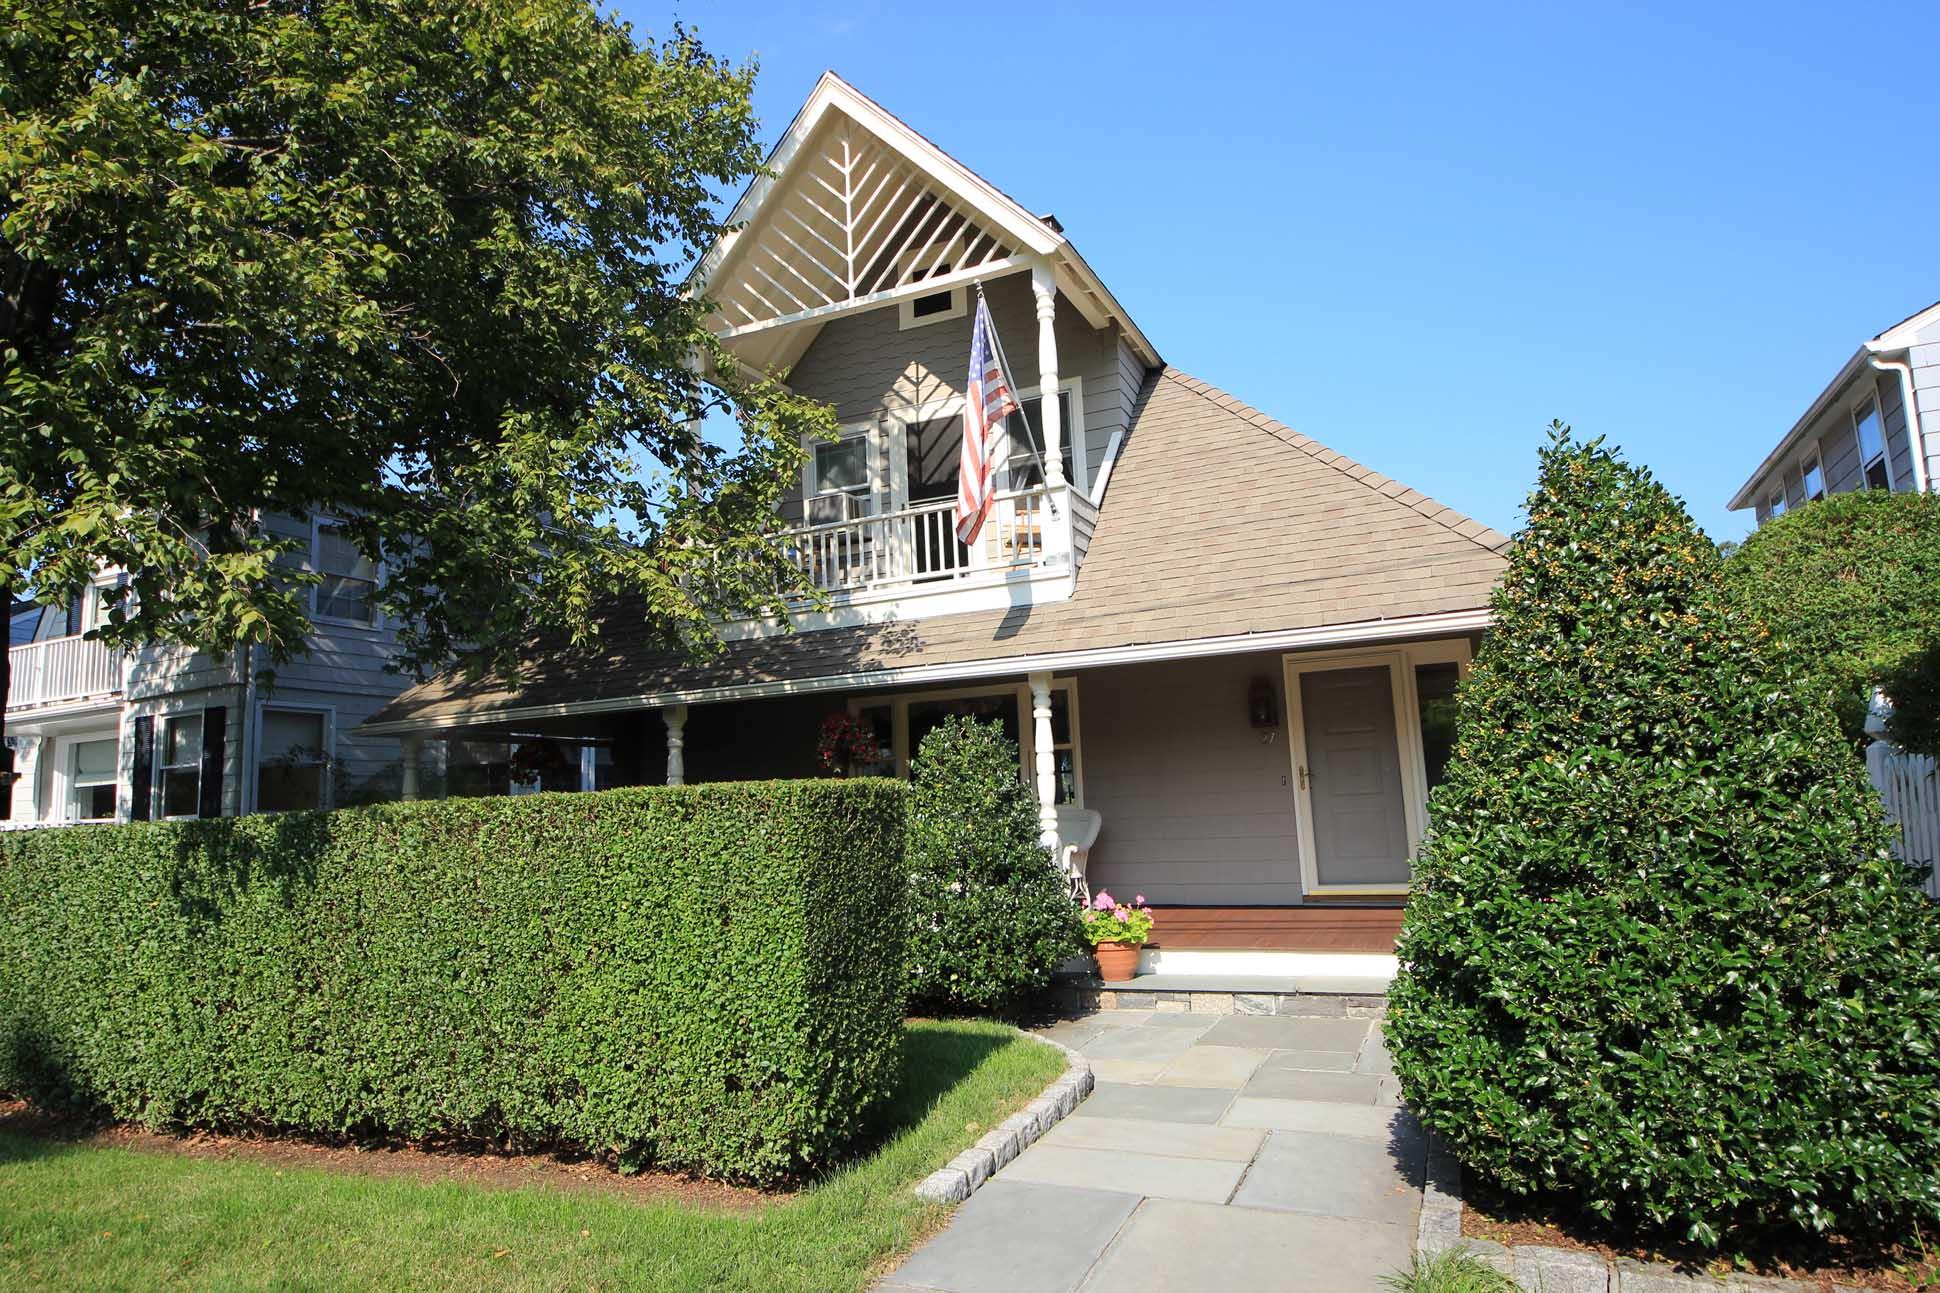 Villa per Vendita alle ore Beach Community Living 27 Ensign Road Rowayton, Norwalk, Connecticut 06853 Stati Uniti